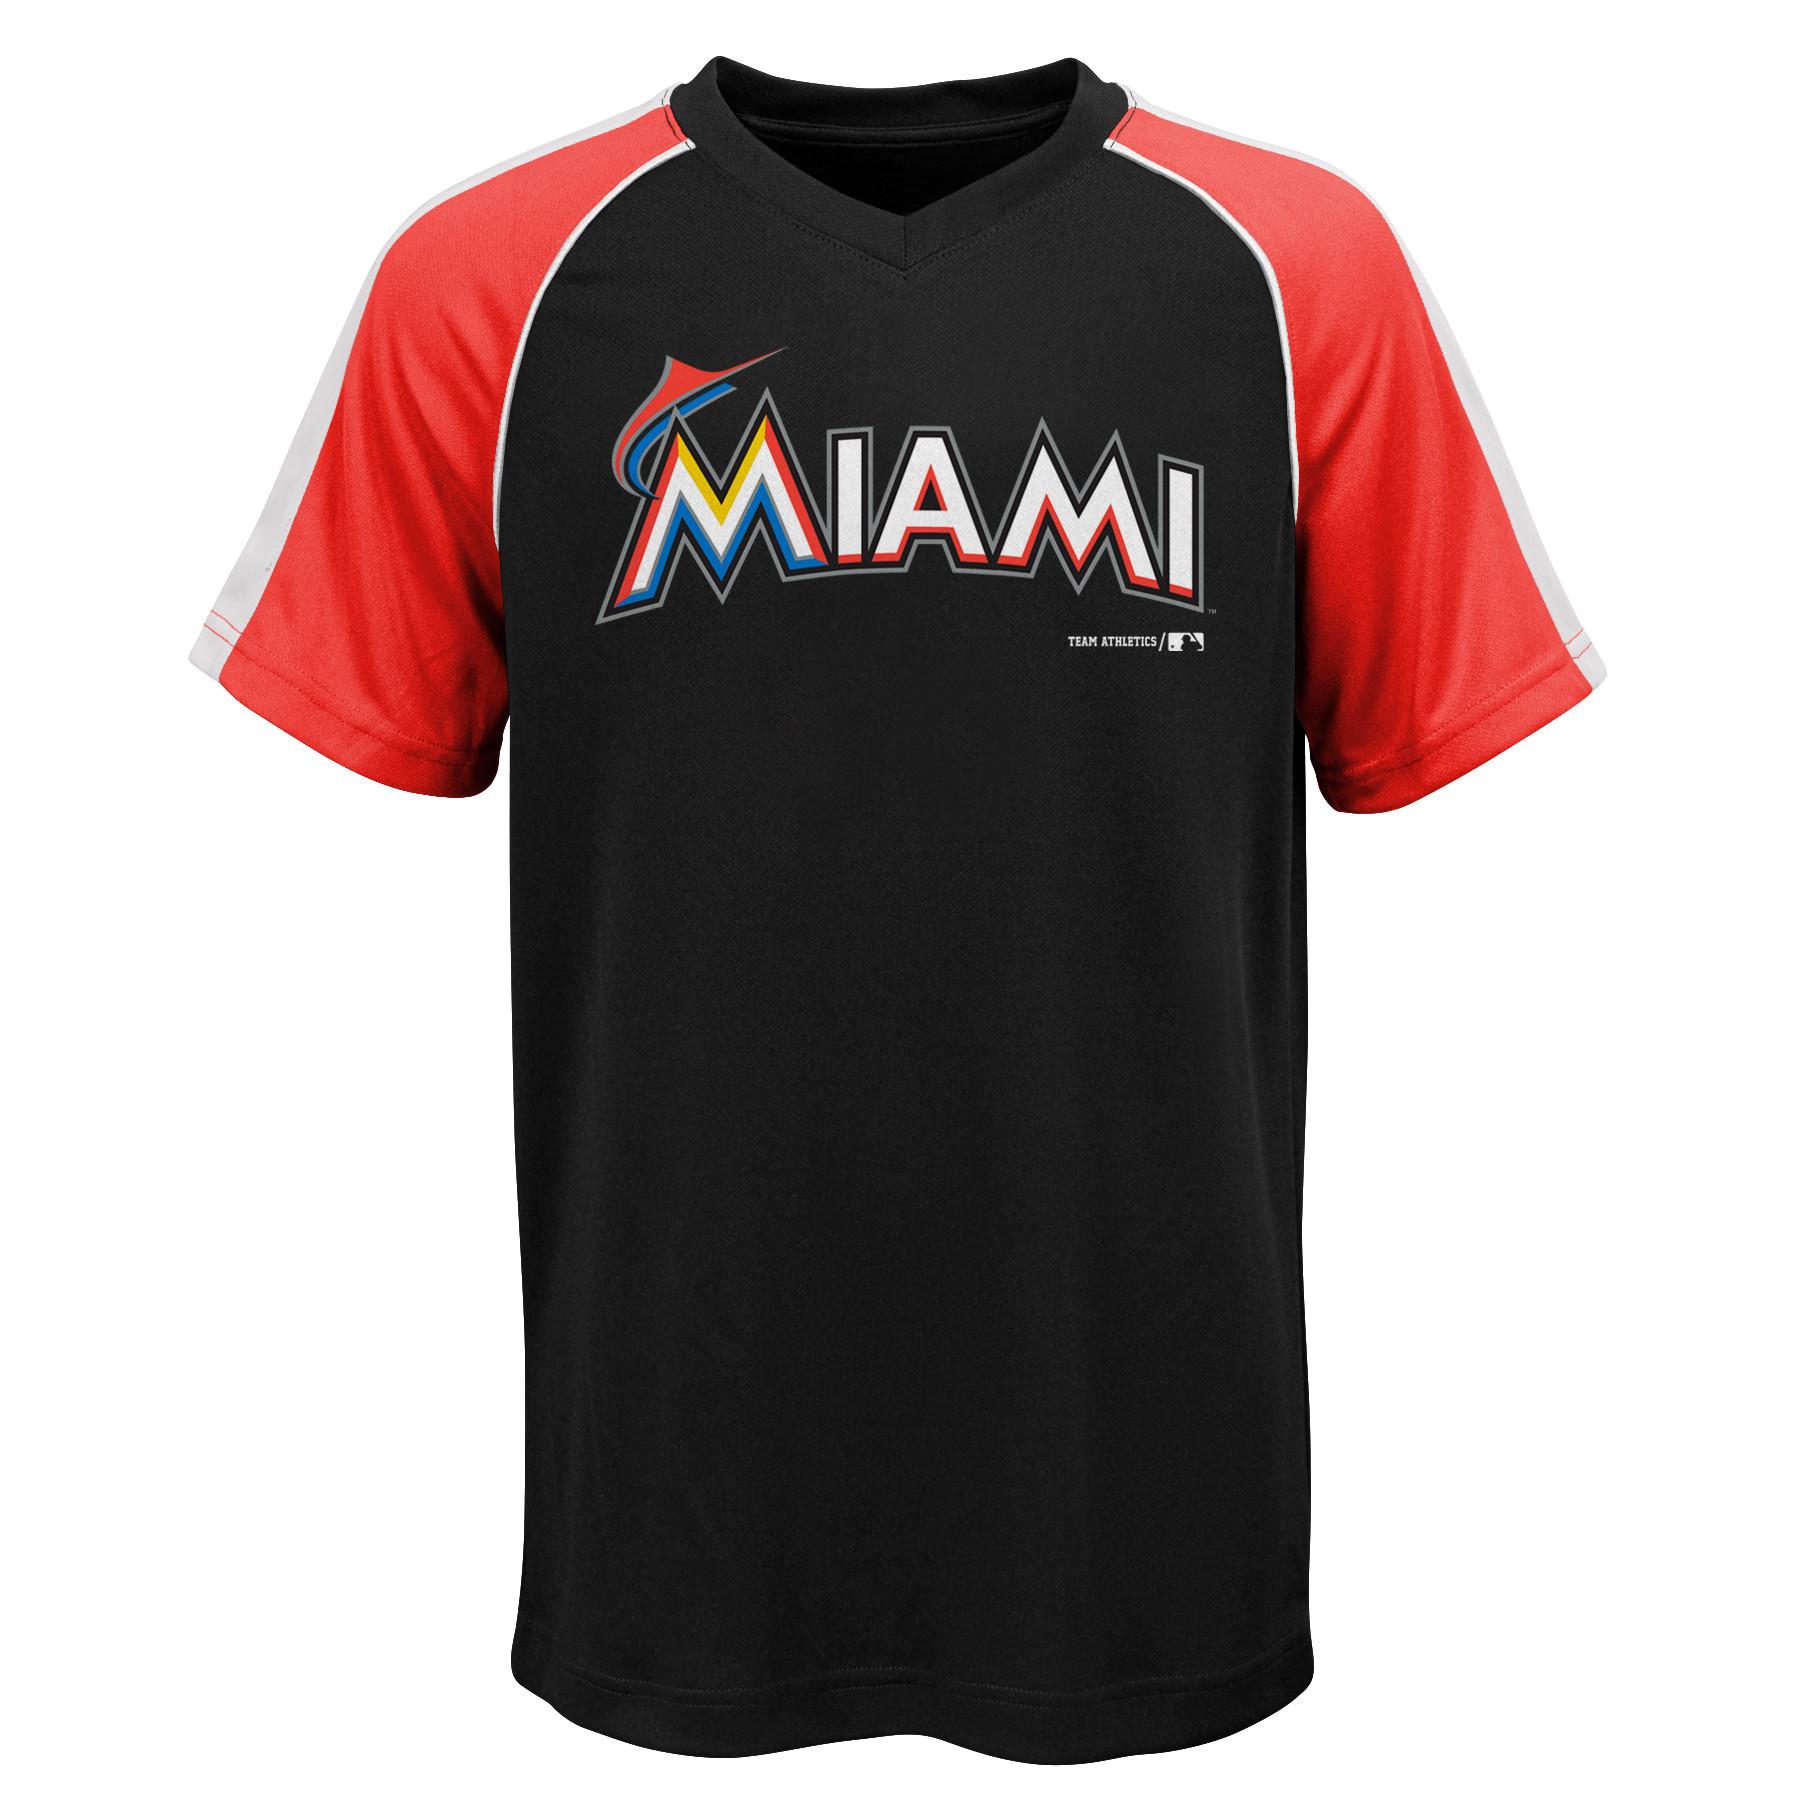 MLB Miami MARLINS TEE Short Sleeve Boys Fashion Jersey Tee 100% Polyester Pin Dot Mesh Jersey Team Tee 4-18